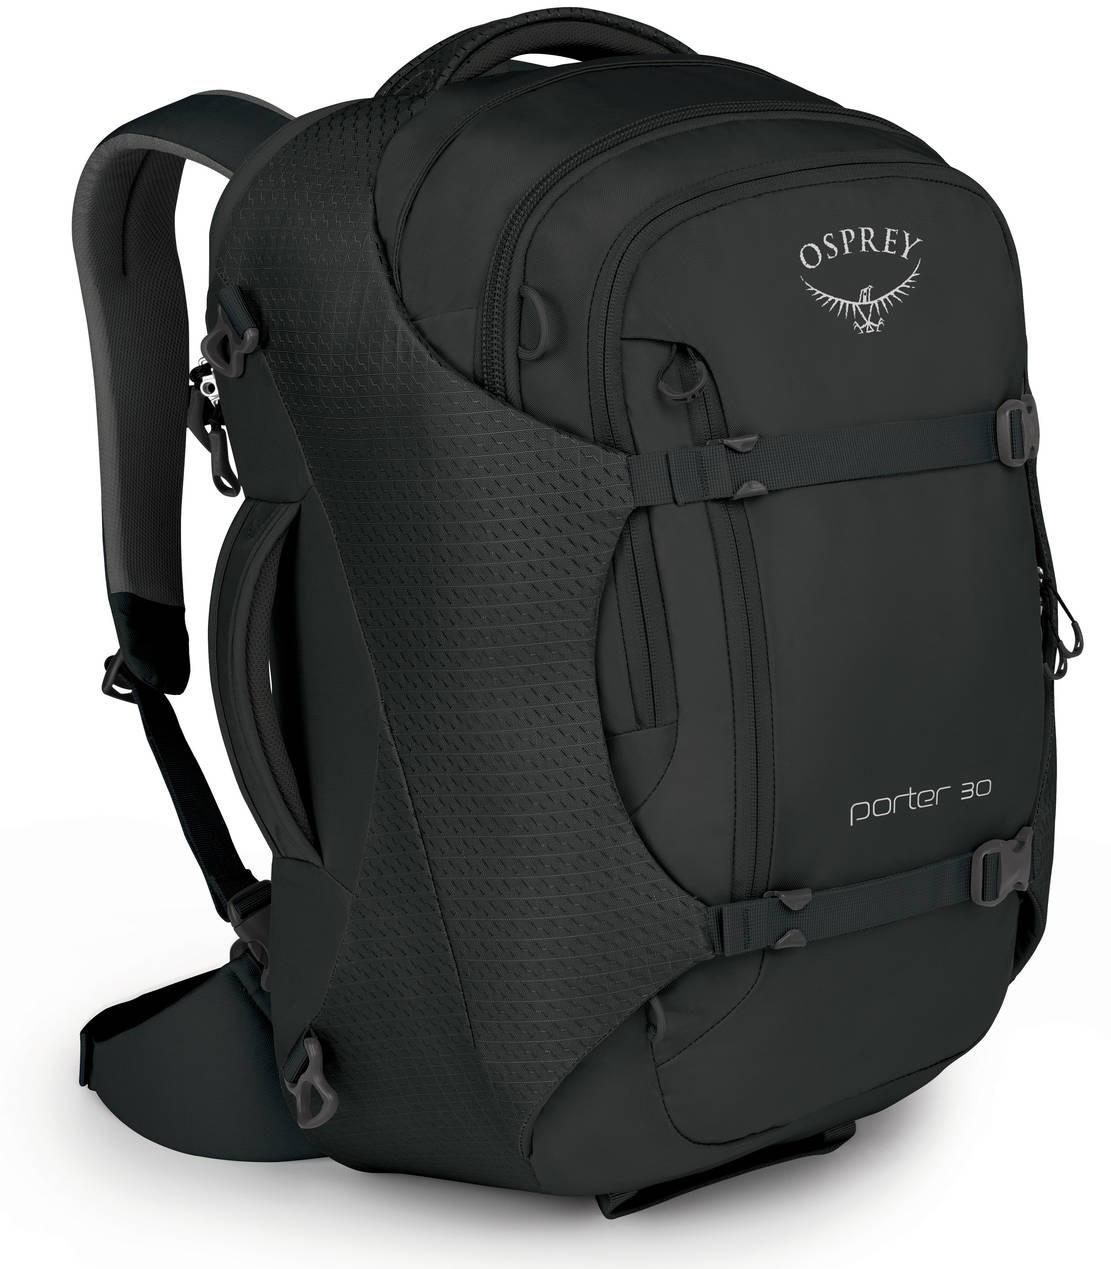 Сумки-рюкзаки Сумка-рюкзак Osprey Porter 30 Black Porter_30_F17_Side_Black_web.jpg